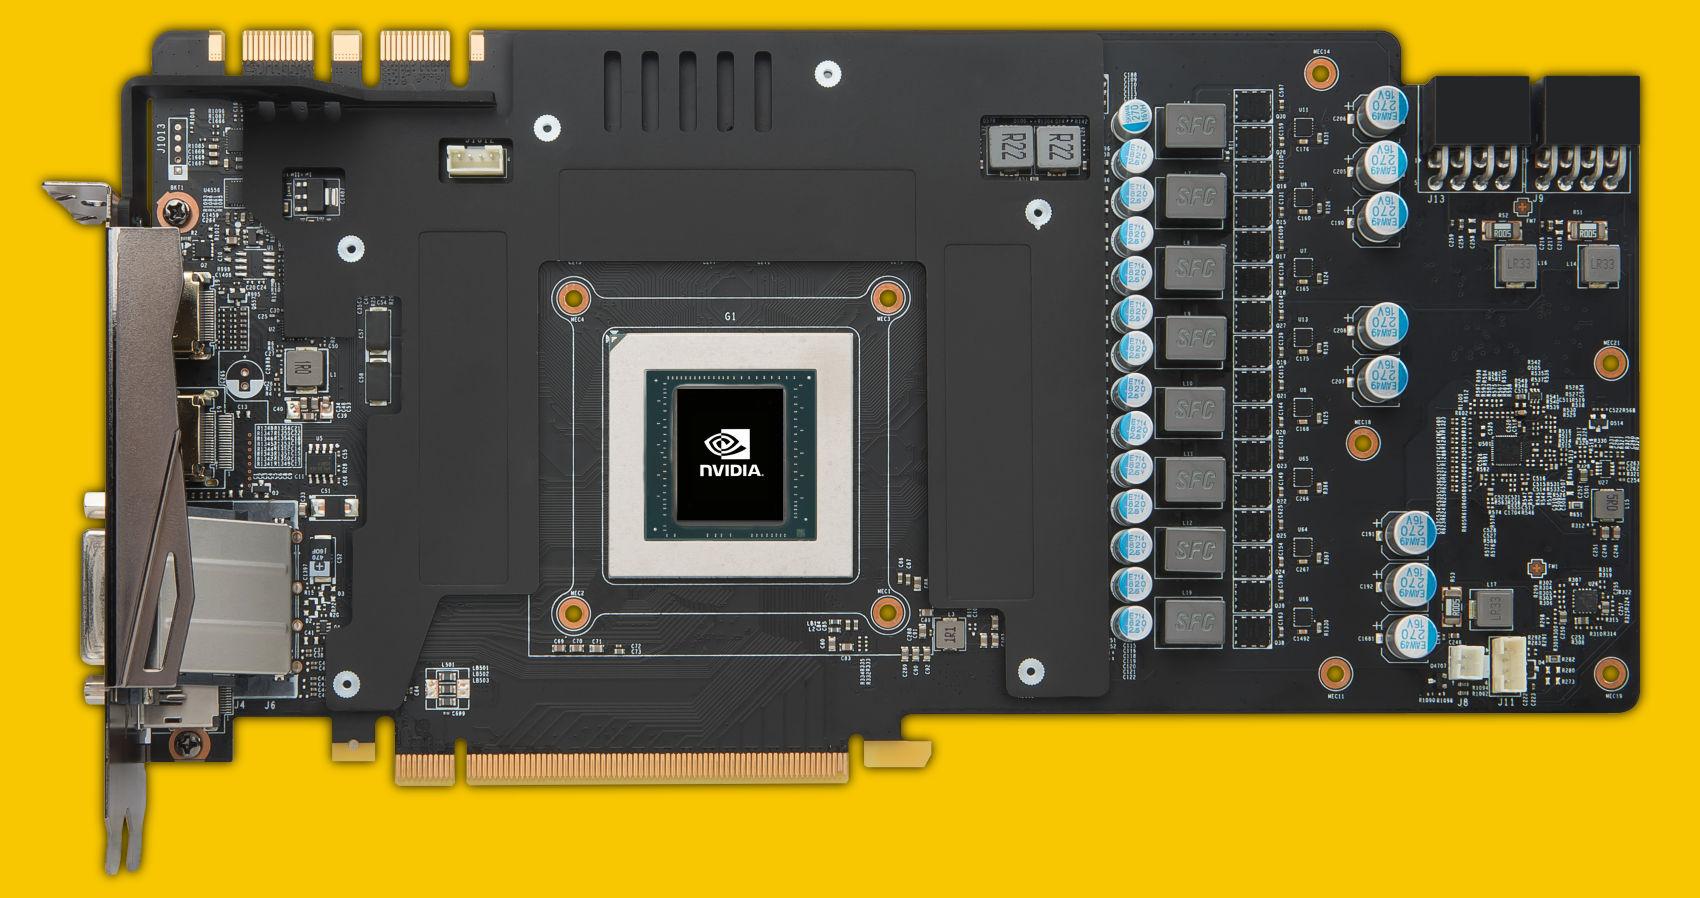 MSI GeForce GTX 1080 Ti ARMOR Review - A closer look @@ MSI